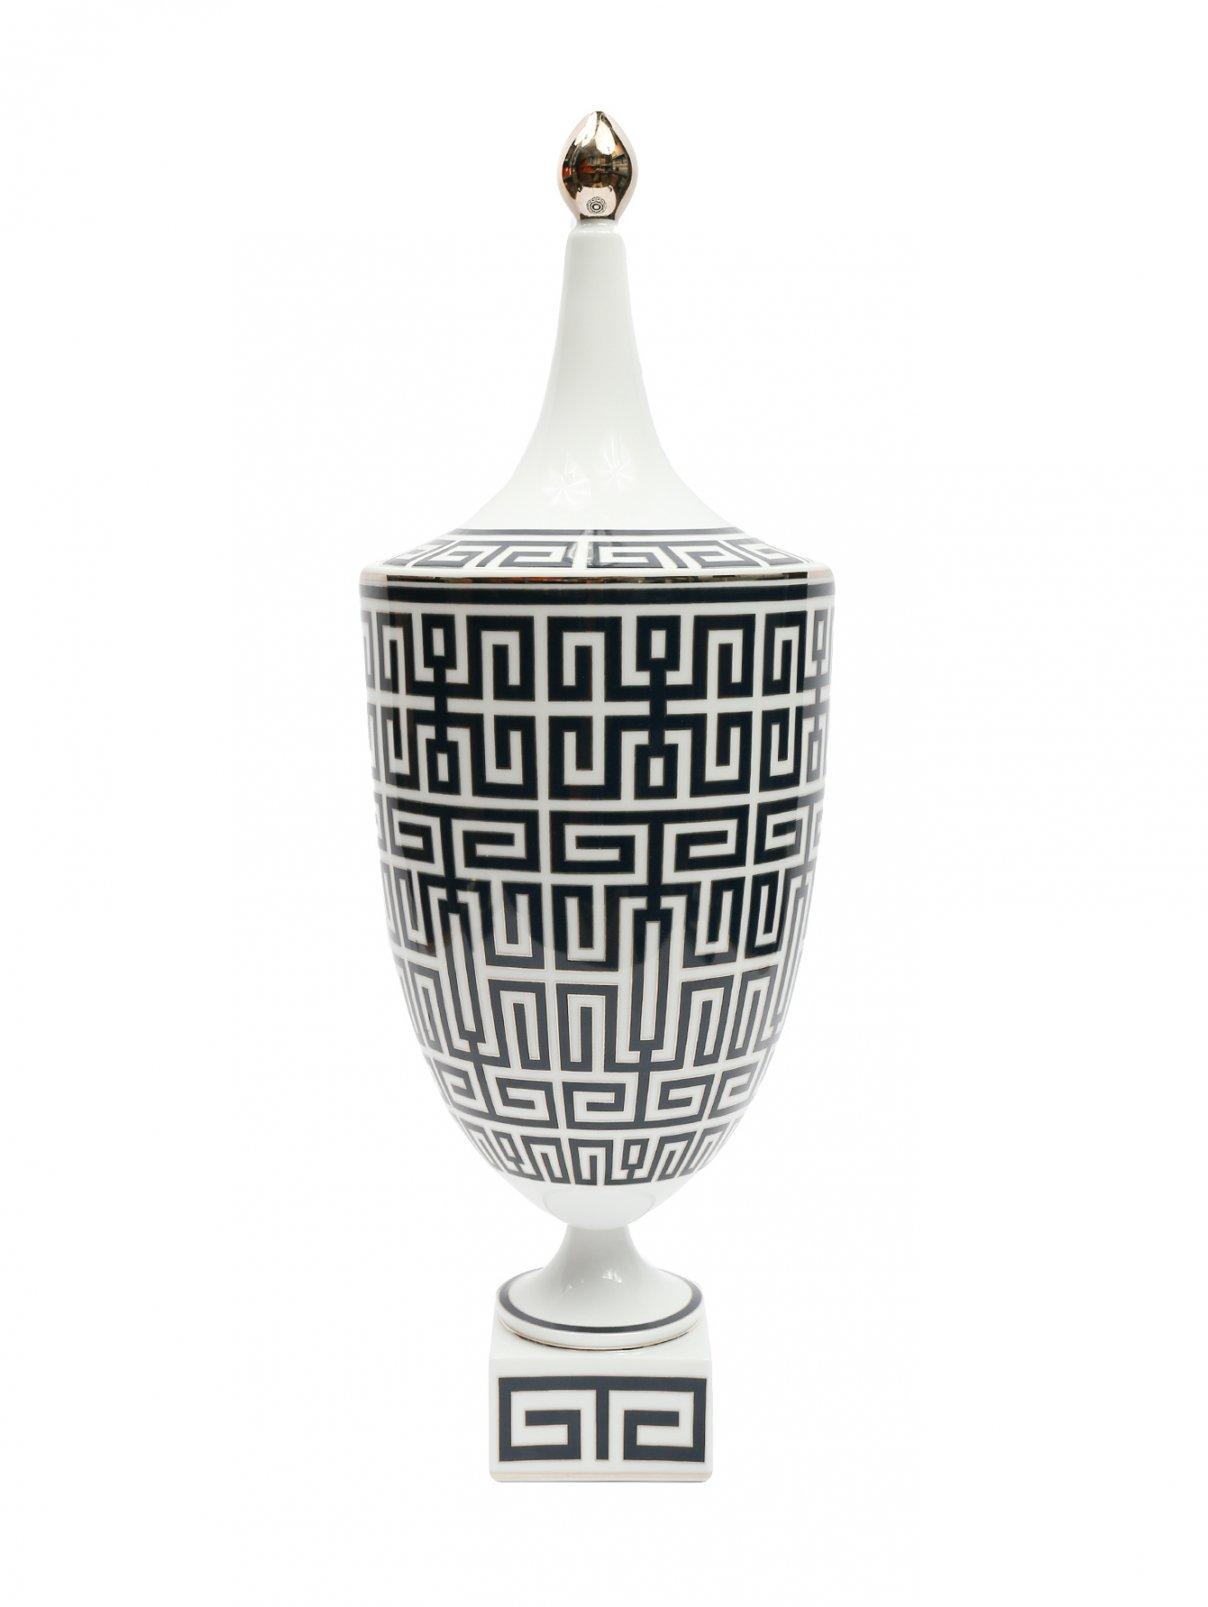 Фарфоровая ваза с орнаментом 16 x 48 Ginori 1735  –  Общий вид